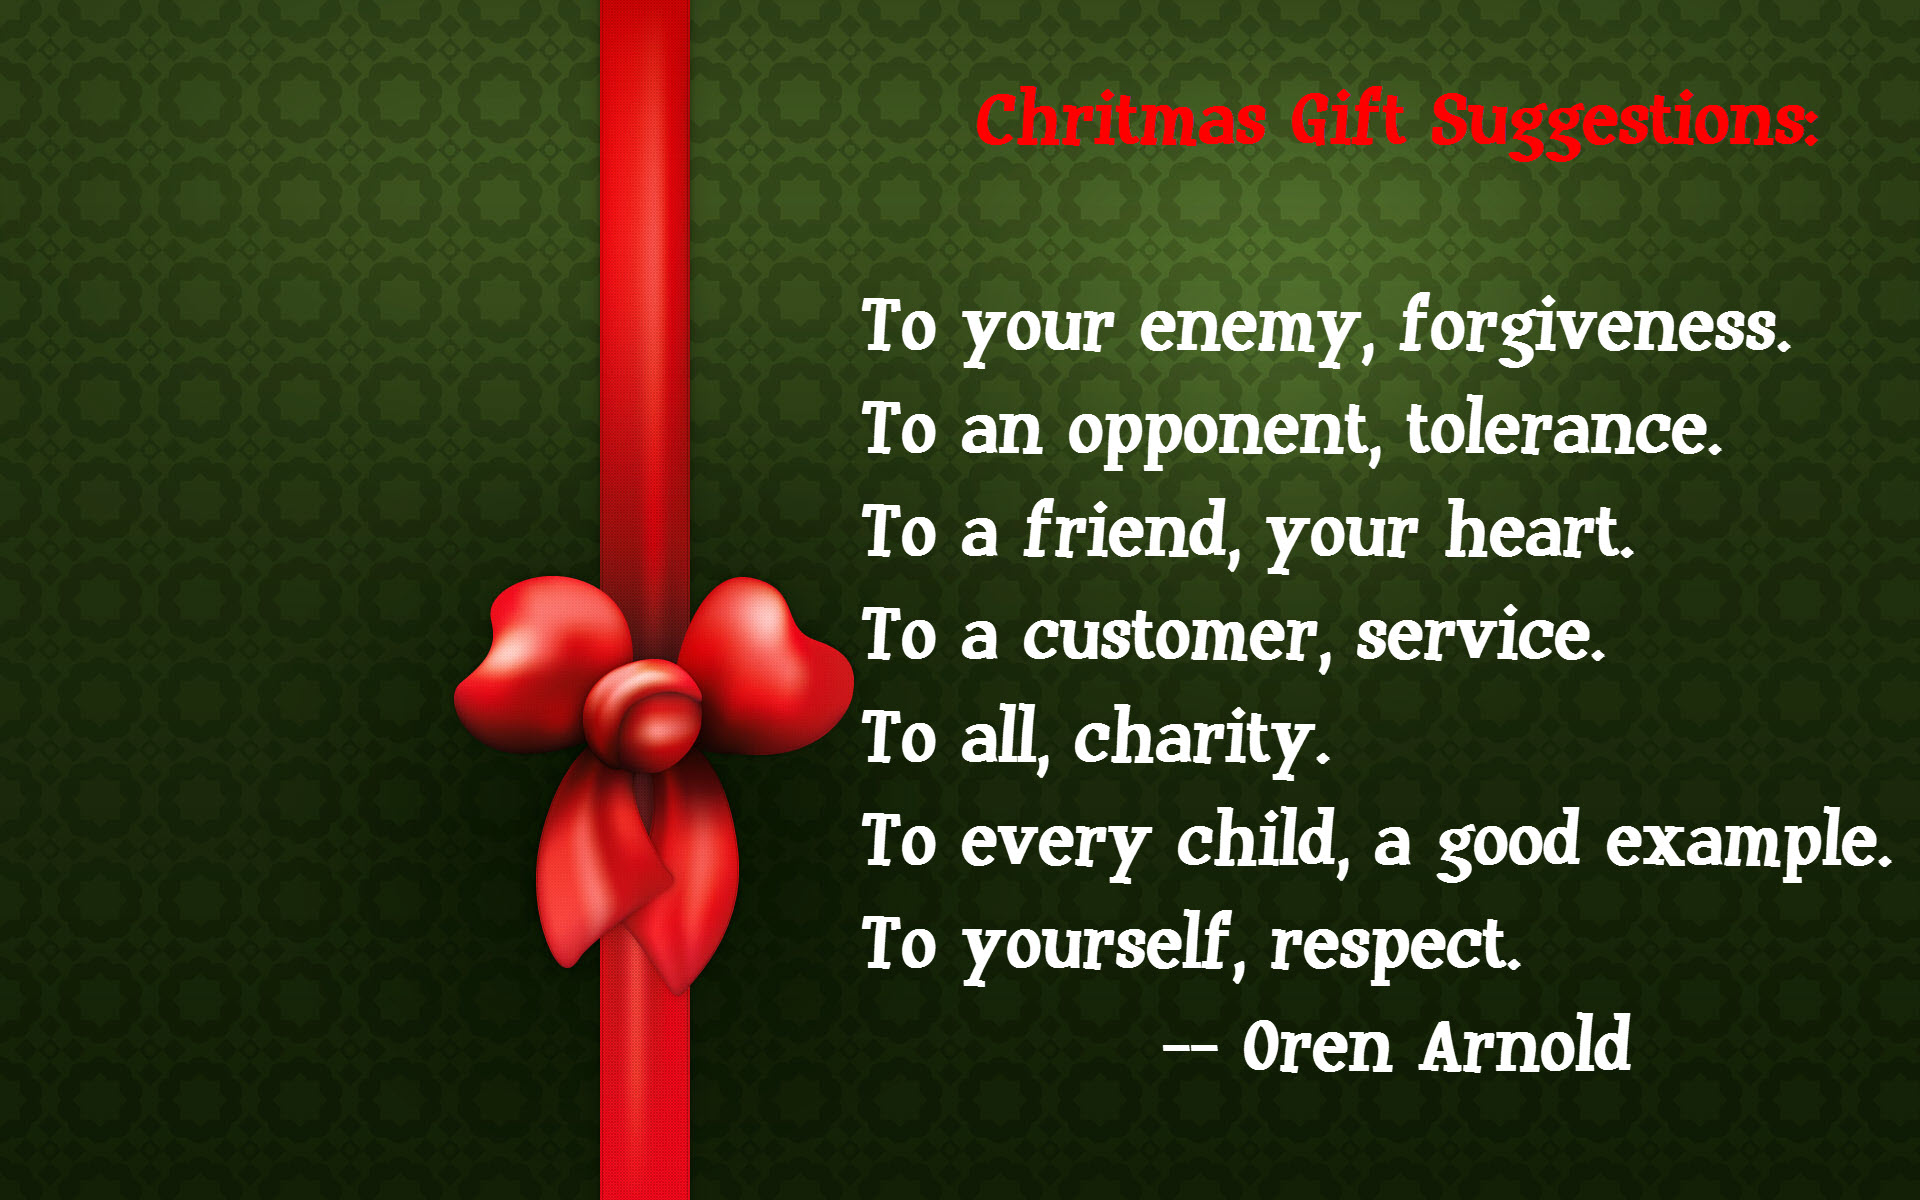 Christmas Gift Suggestions  sc 1 st  Orlando Espinosa - WordPress.com & Christmas Gift Suggestions | Orlando Espinosa